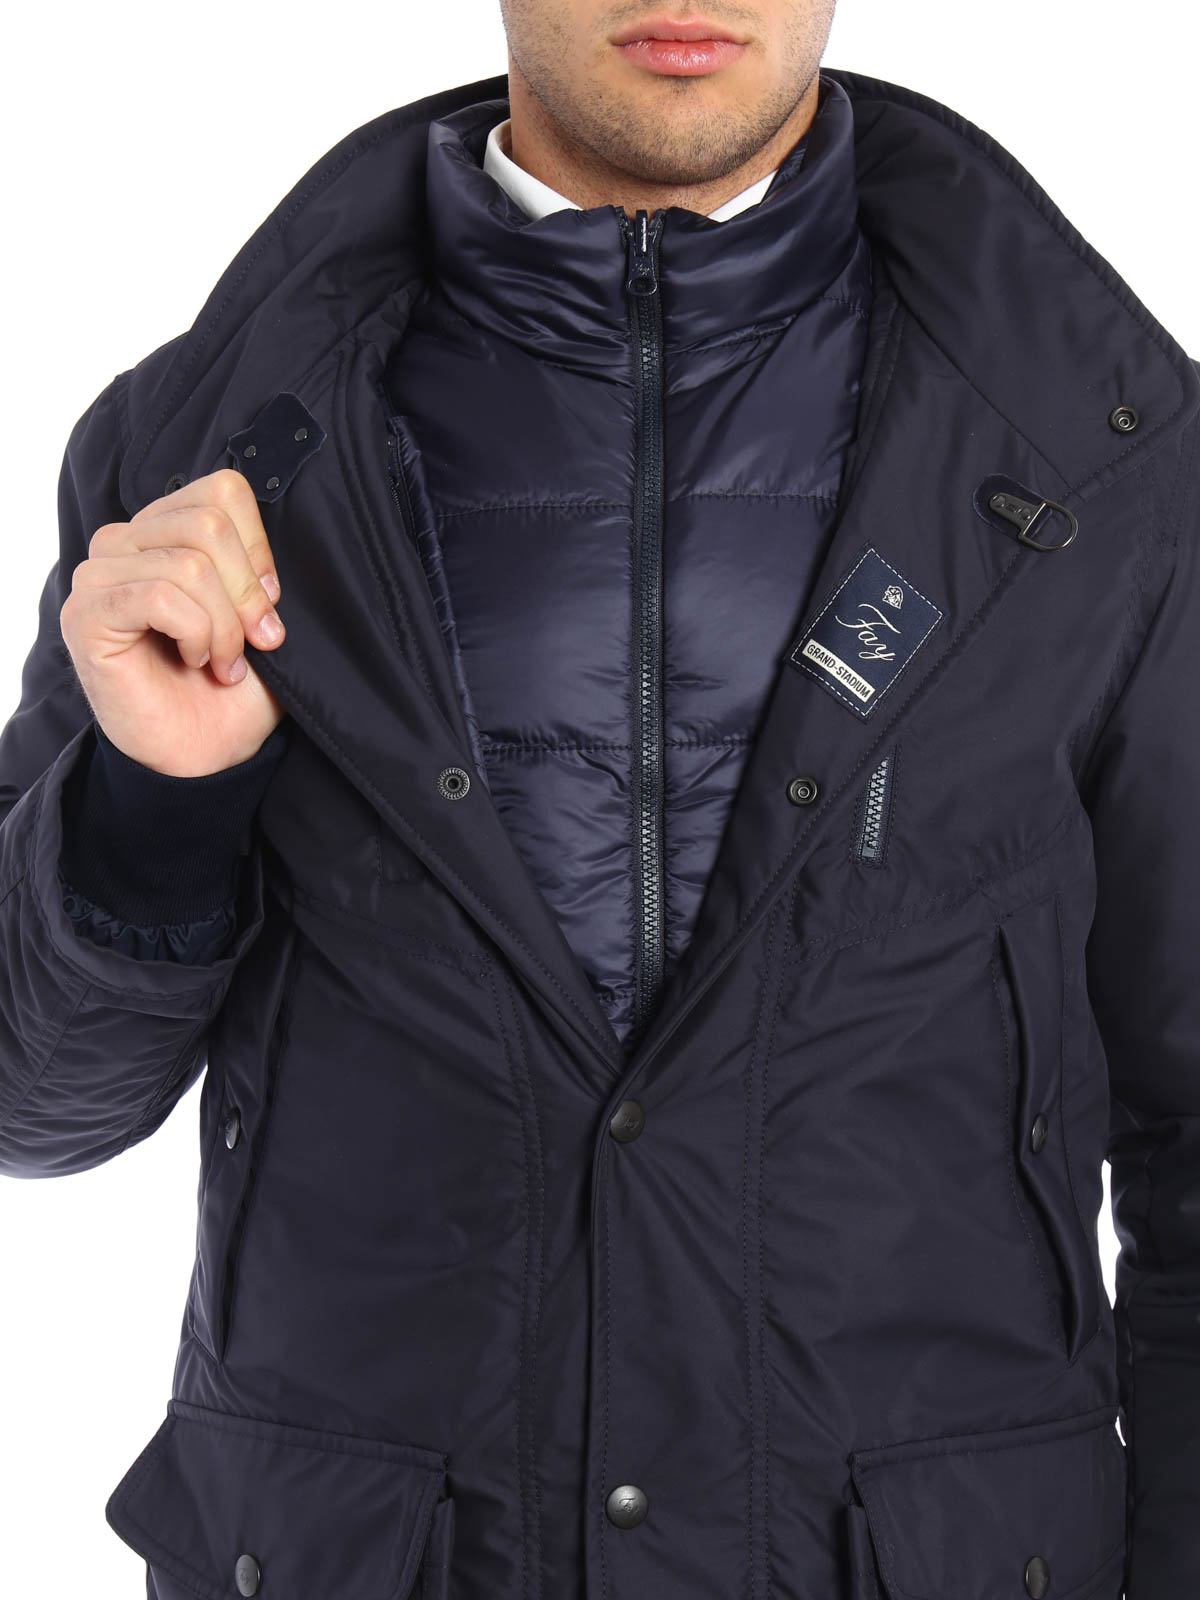 hot sale online 7cea6 29f8c Fay - Nylon field jacket with waistcoat - padded jackets ...